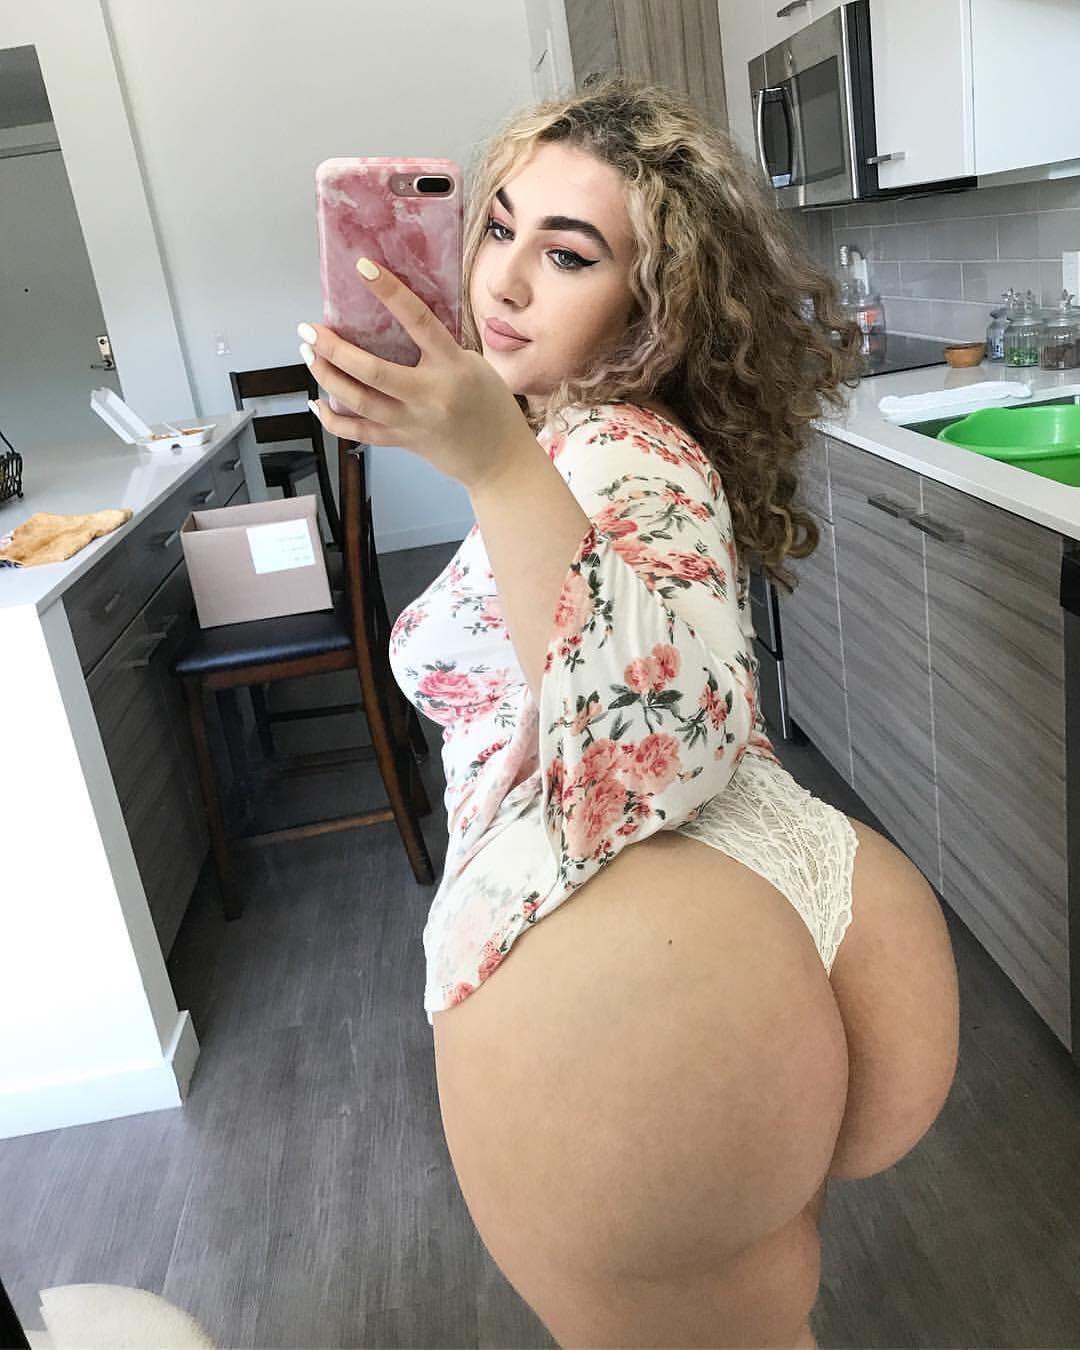 Traprapunzel